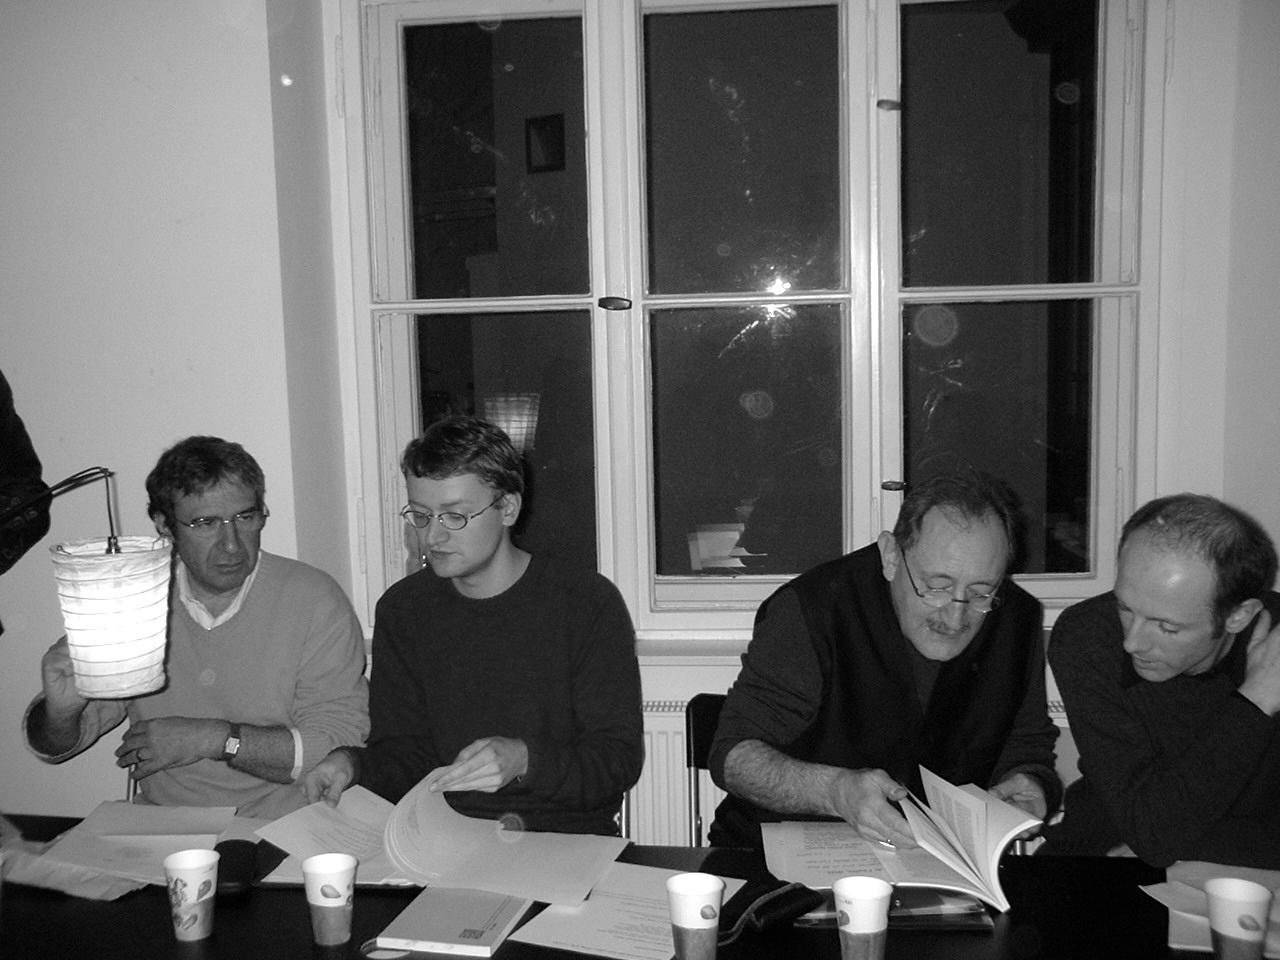 Pierre Le Pillouër, Renatus Deckert, Eric Sarner (Berlin 2005, Librairie Zadig)